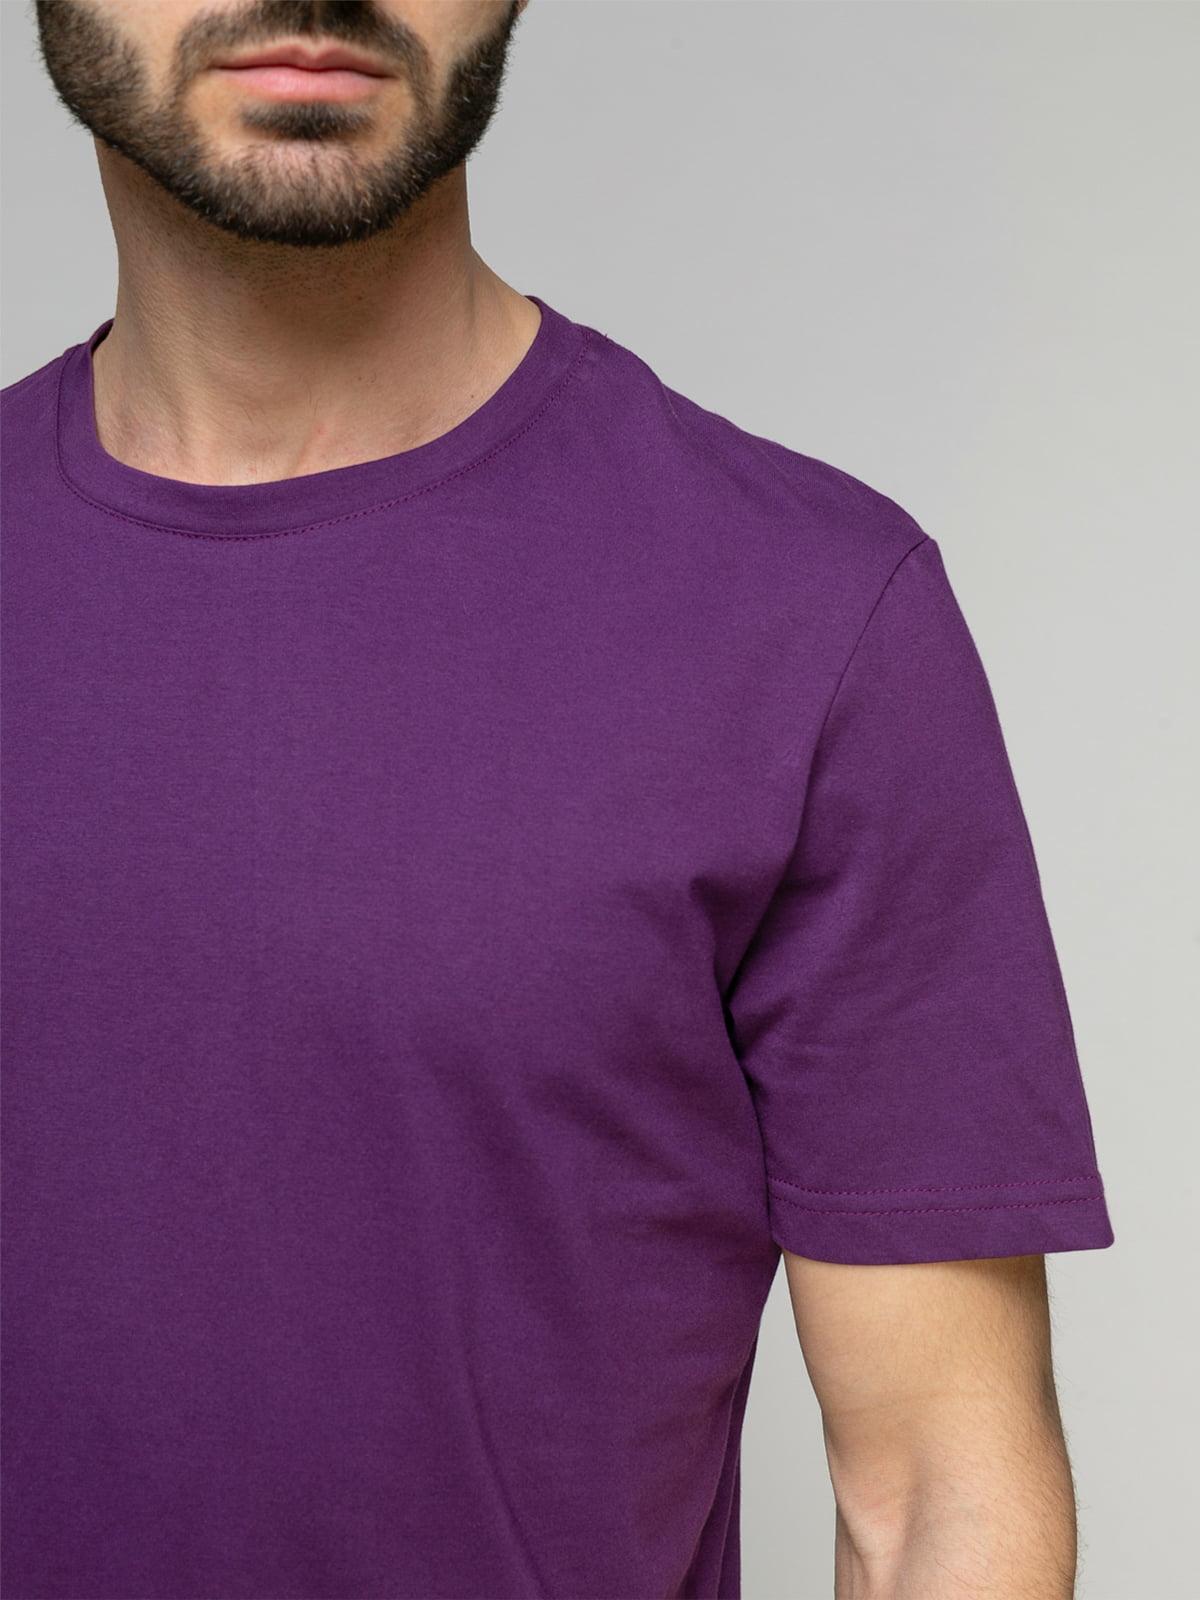 Футболка фіолетова | 4959307 | фото 3